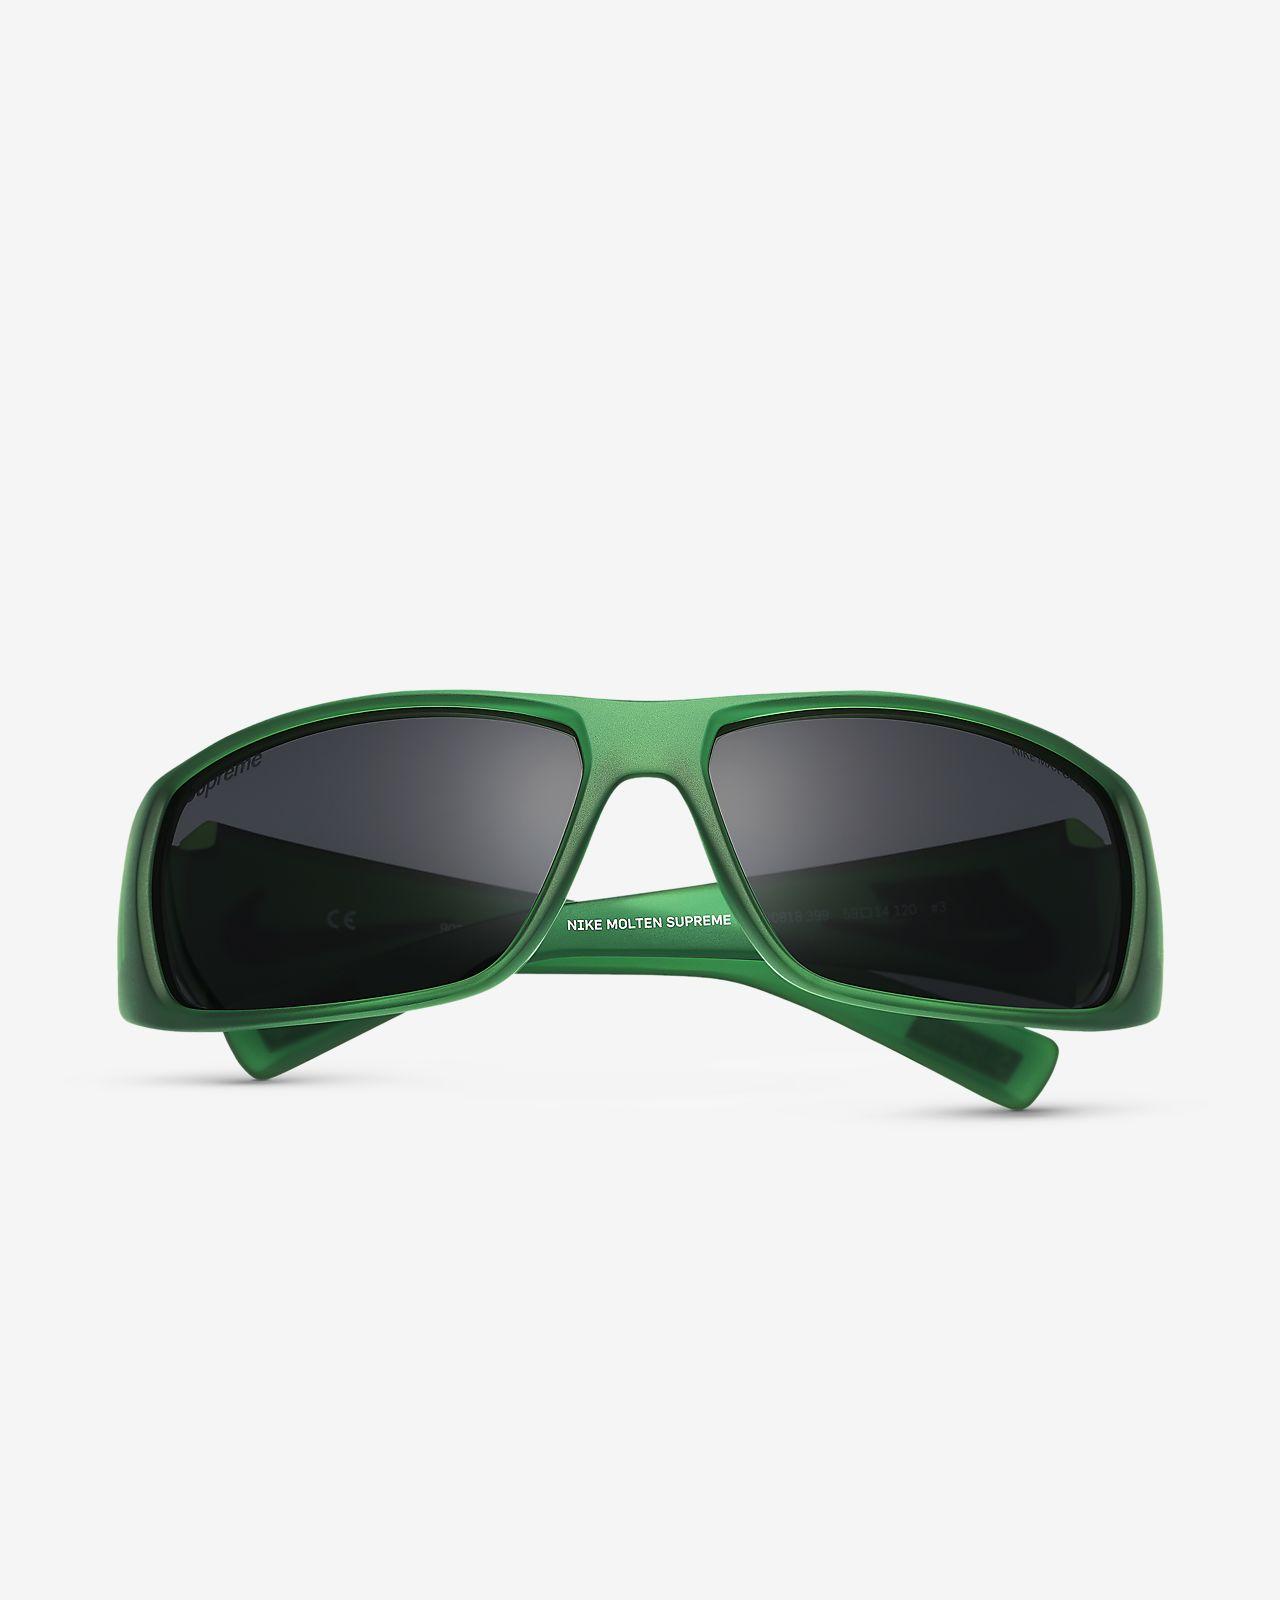 Nike x Supreme Sunglasses